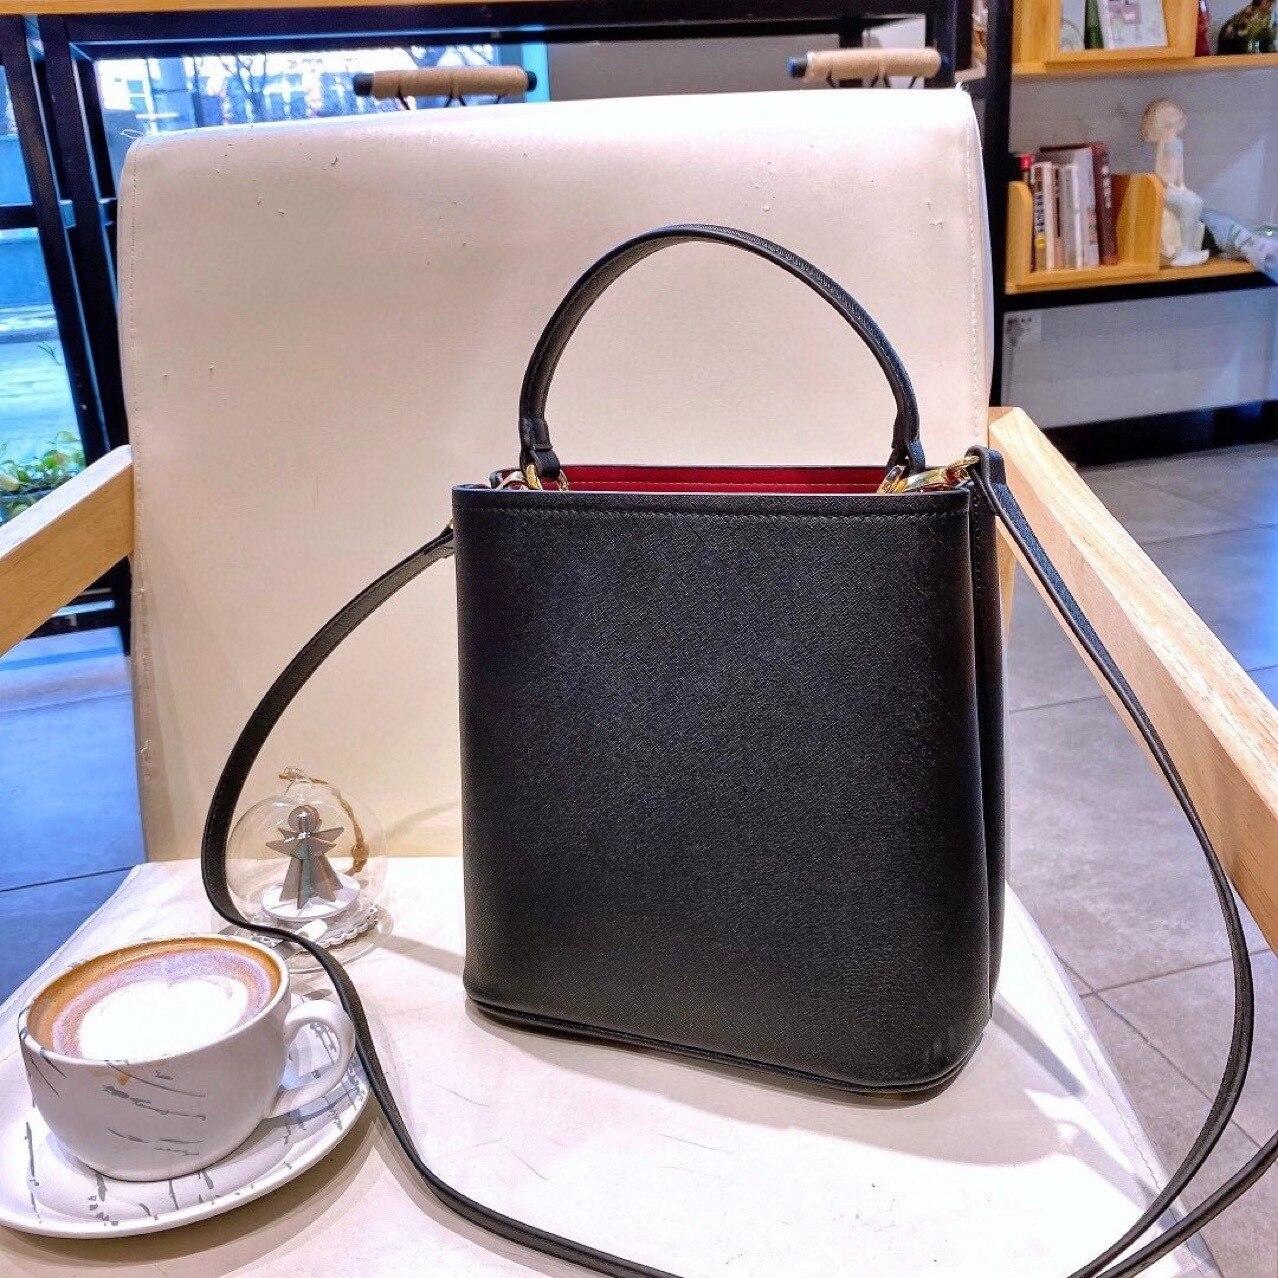 New Fashion Top Leather Designer Handbag, 2021 New Season Fashion Women Shoulder Bag Designer Bag handbags women bags